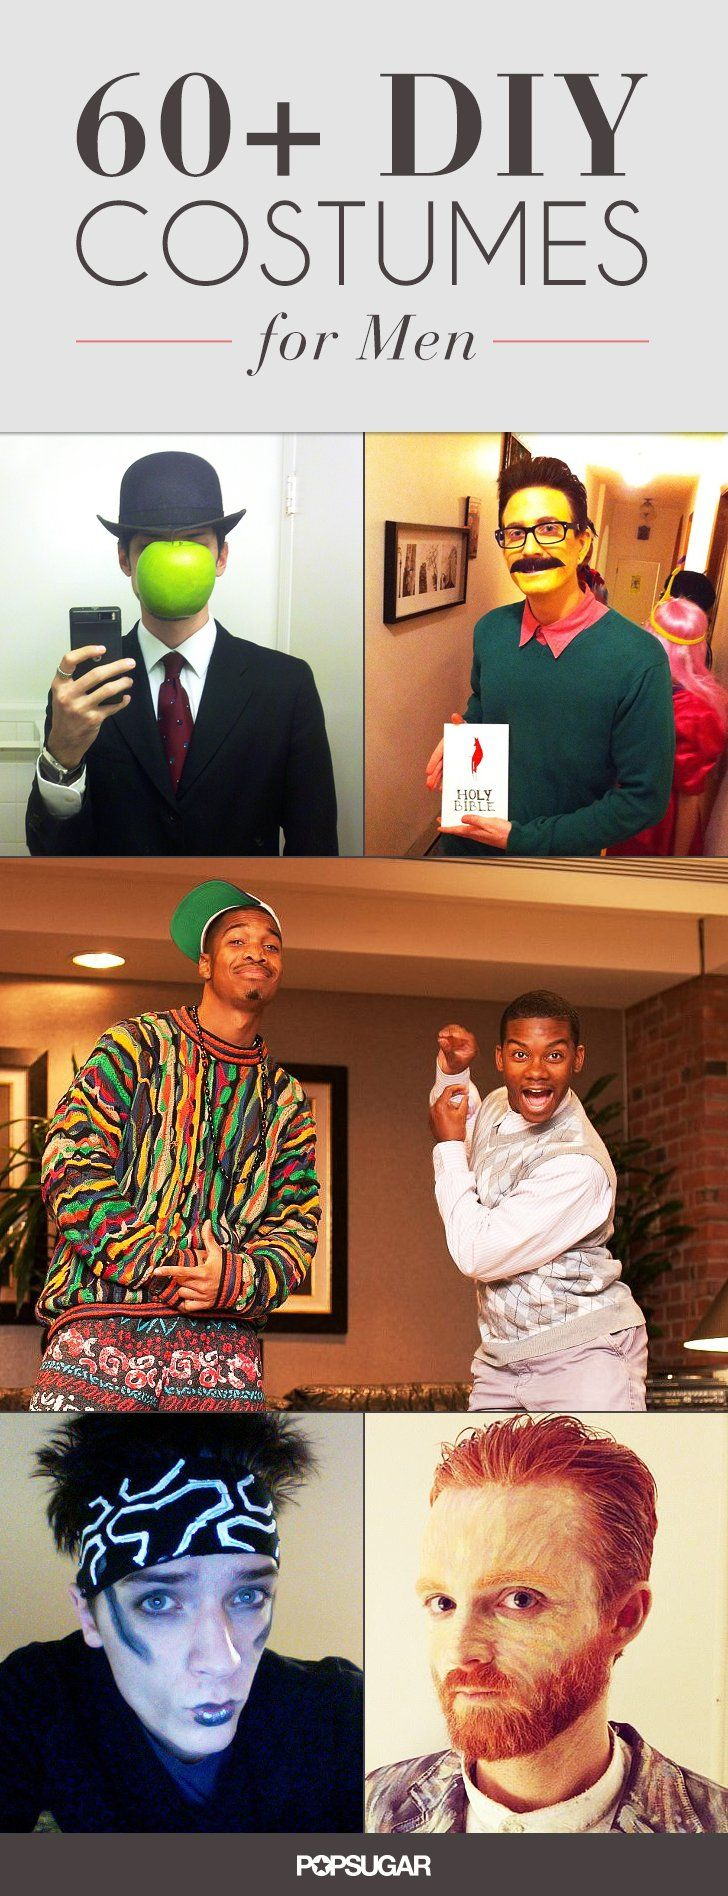 66 wildly creative diy costumes for men cool pinterest kost m halloween und diy kost m. Black Bedroom Furniture Sets. Home Design Ideas